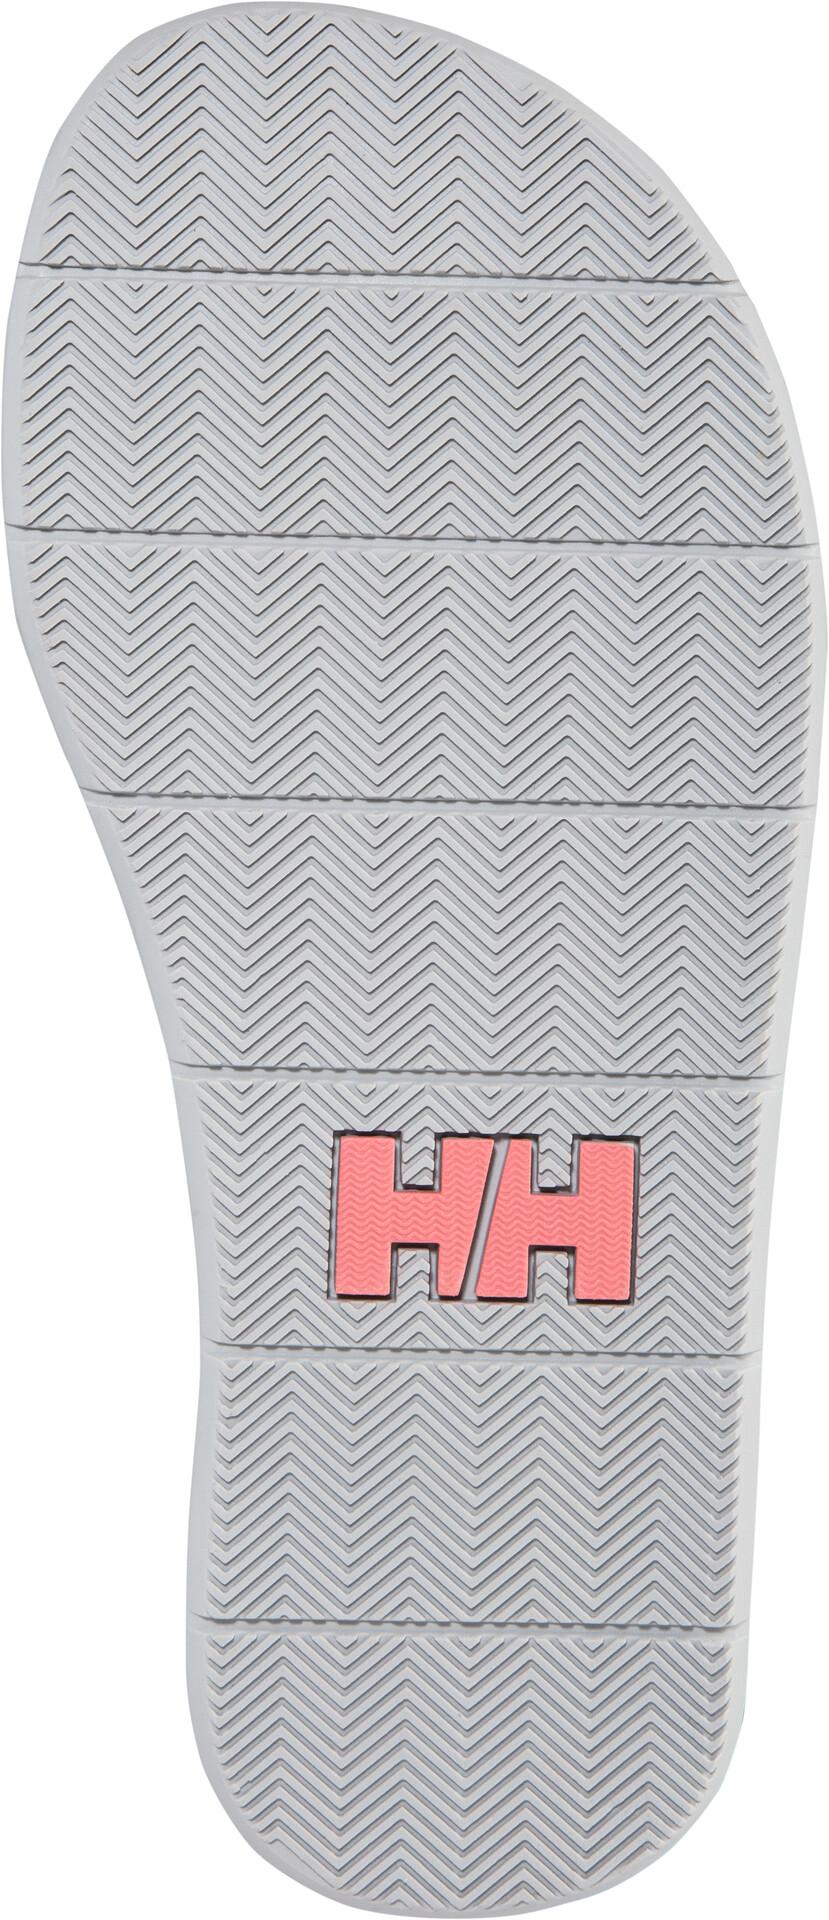 Helly Hansen Seasand HP Sandali Donna, shell pink/plum/cloudy white/off white su Addnature AgoSx